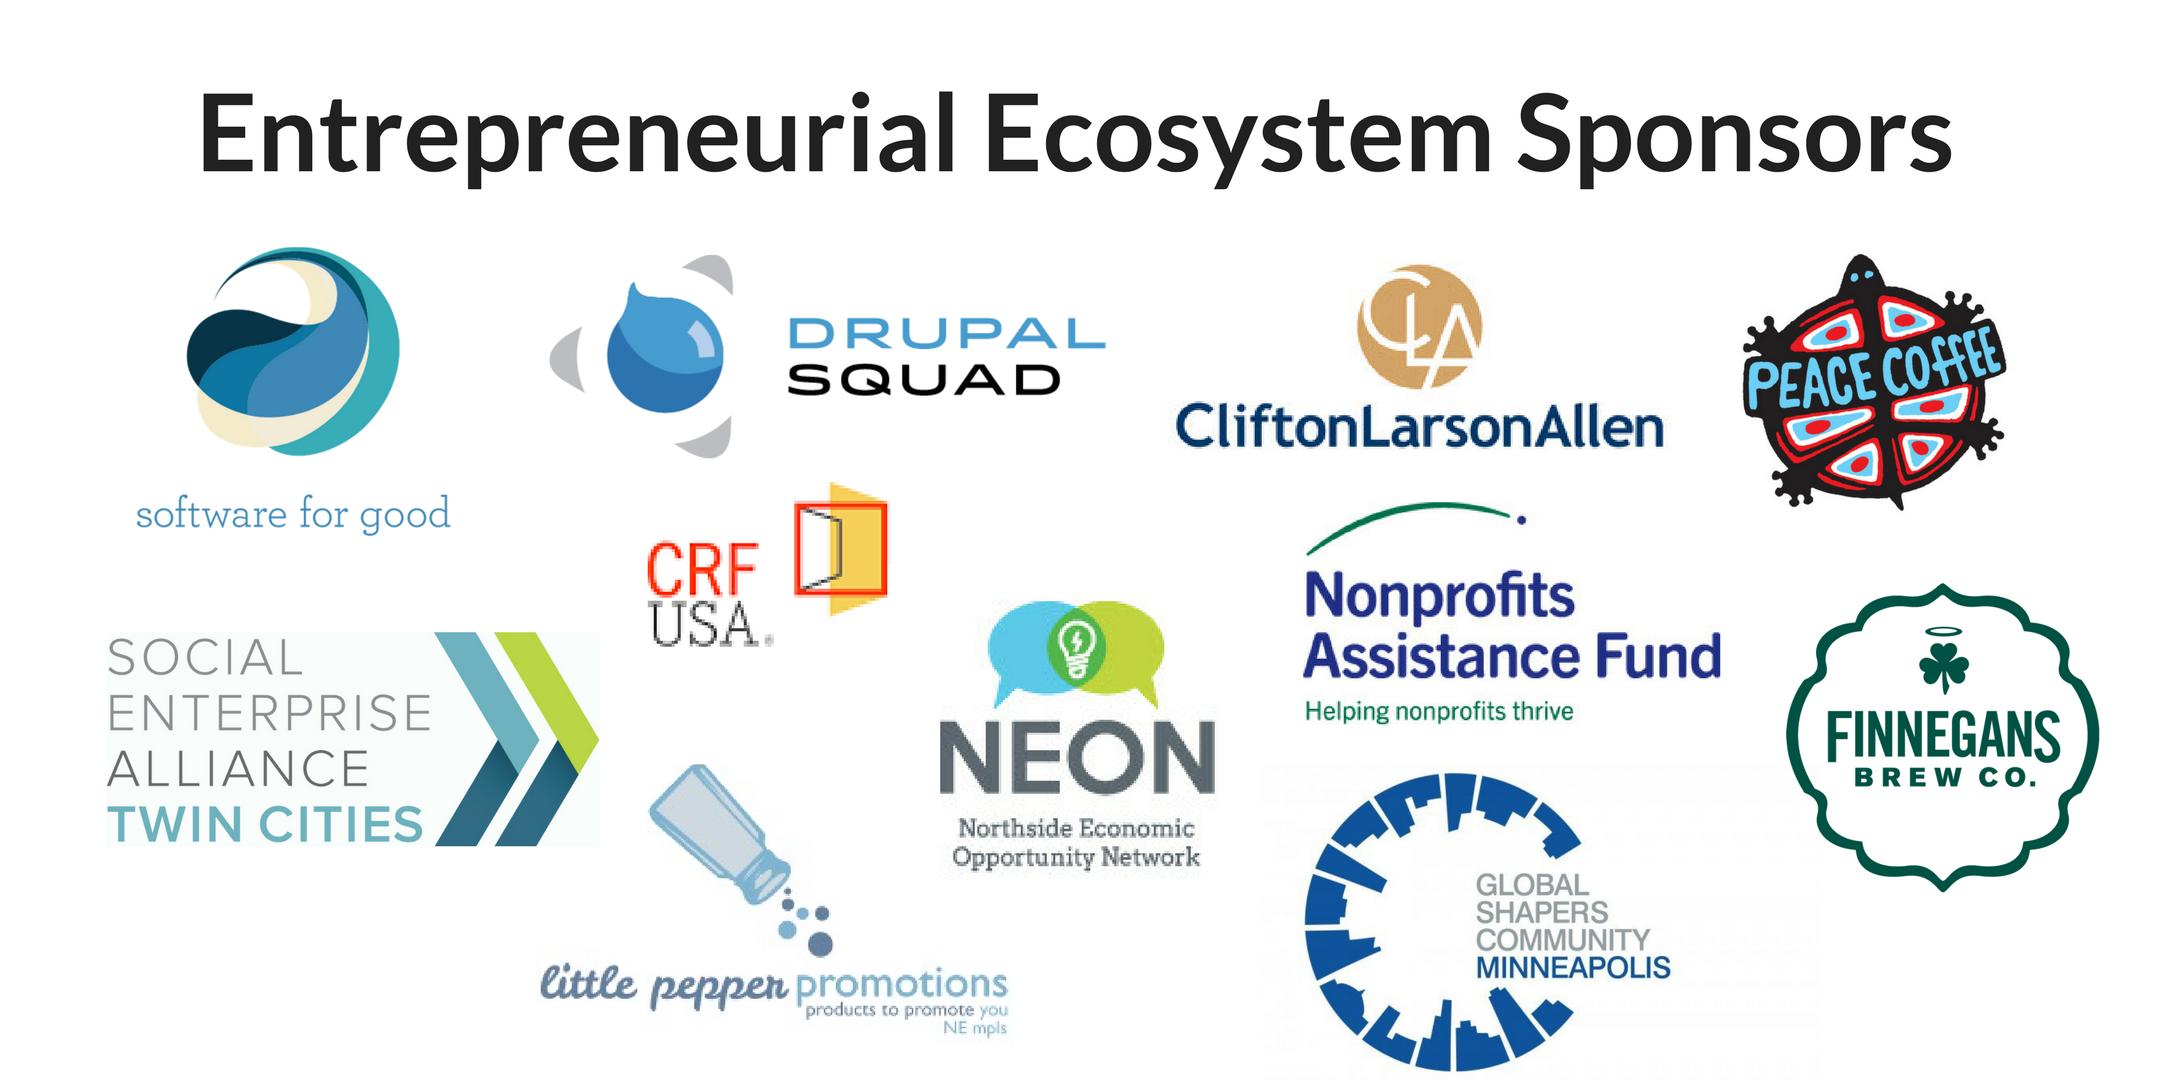 entrepreneurial ecosystem sponsors